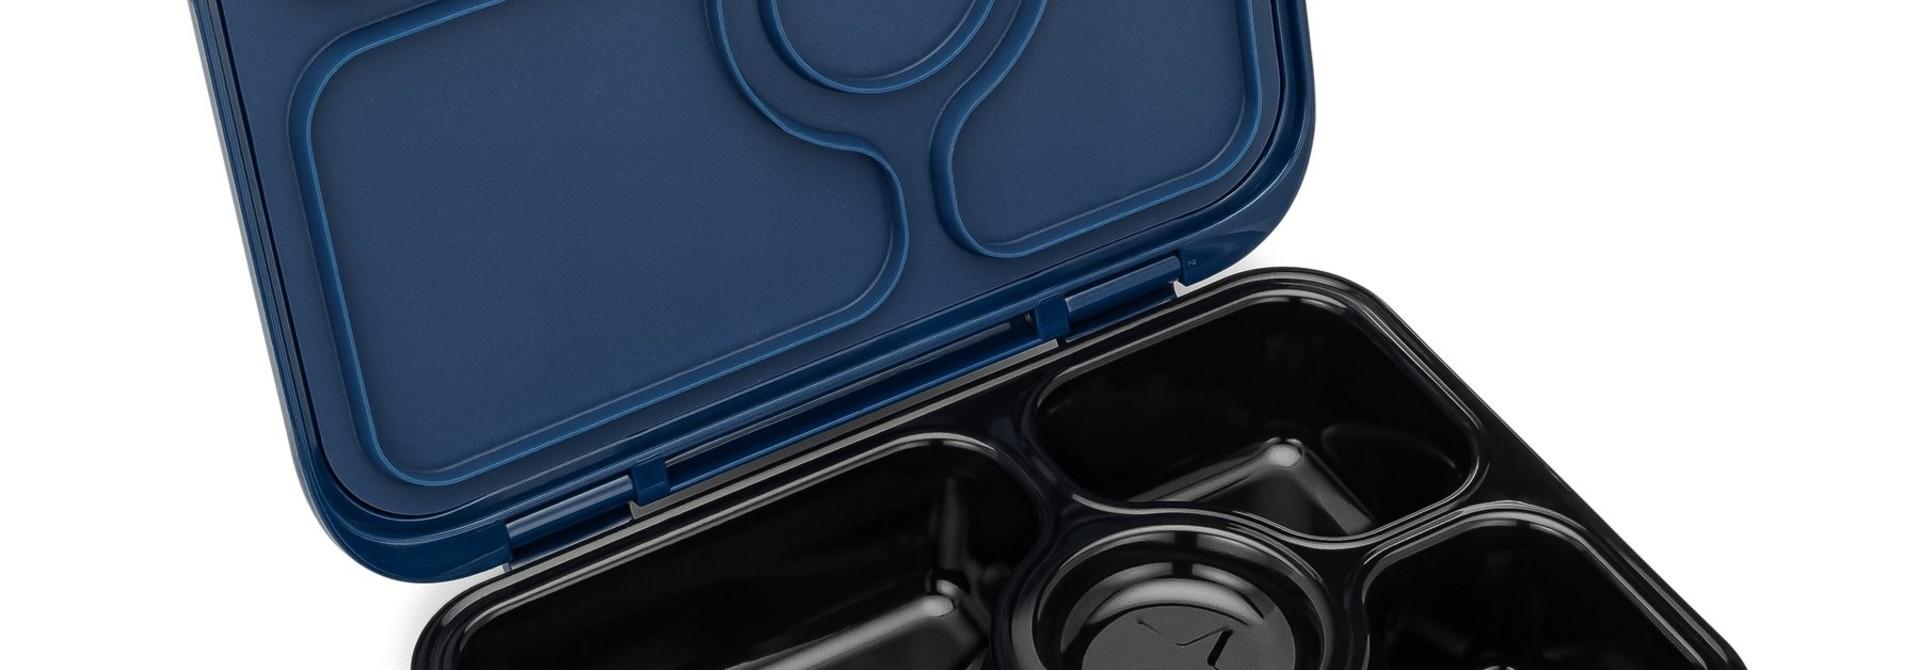 Stainless steel Bento Box with ceramic tray - Santa Fe blue